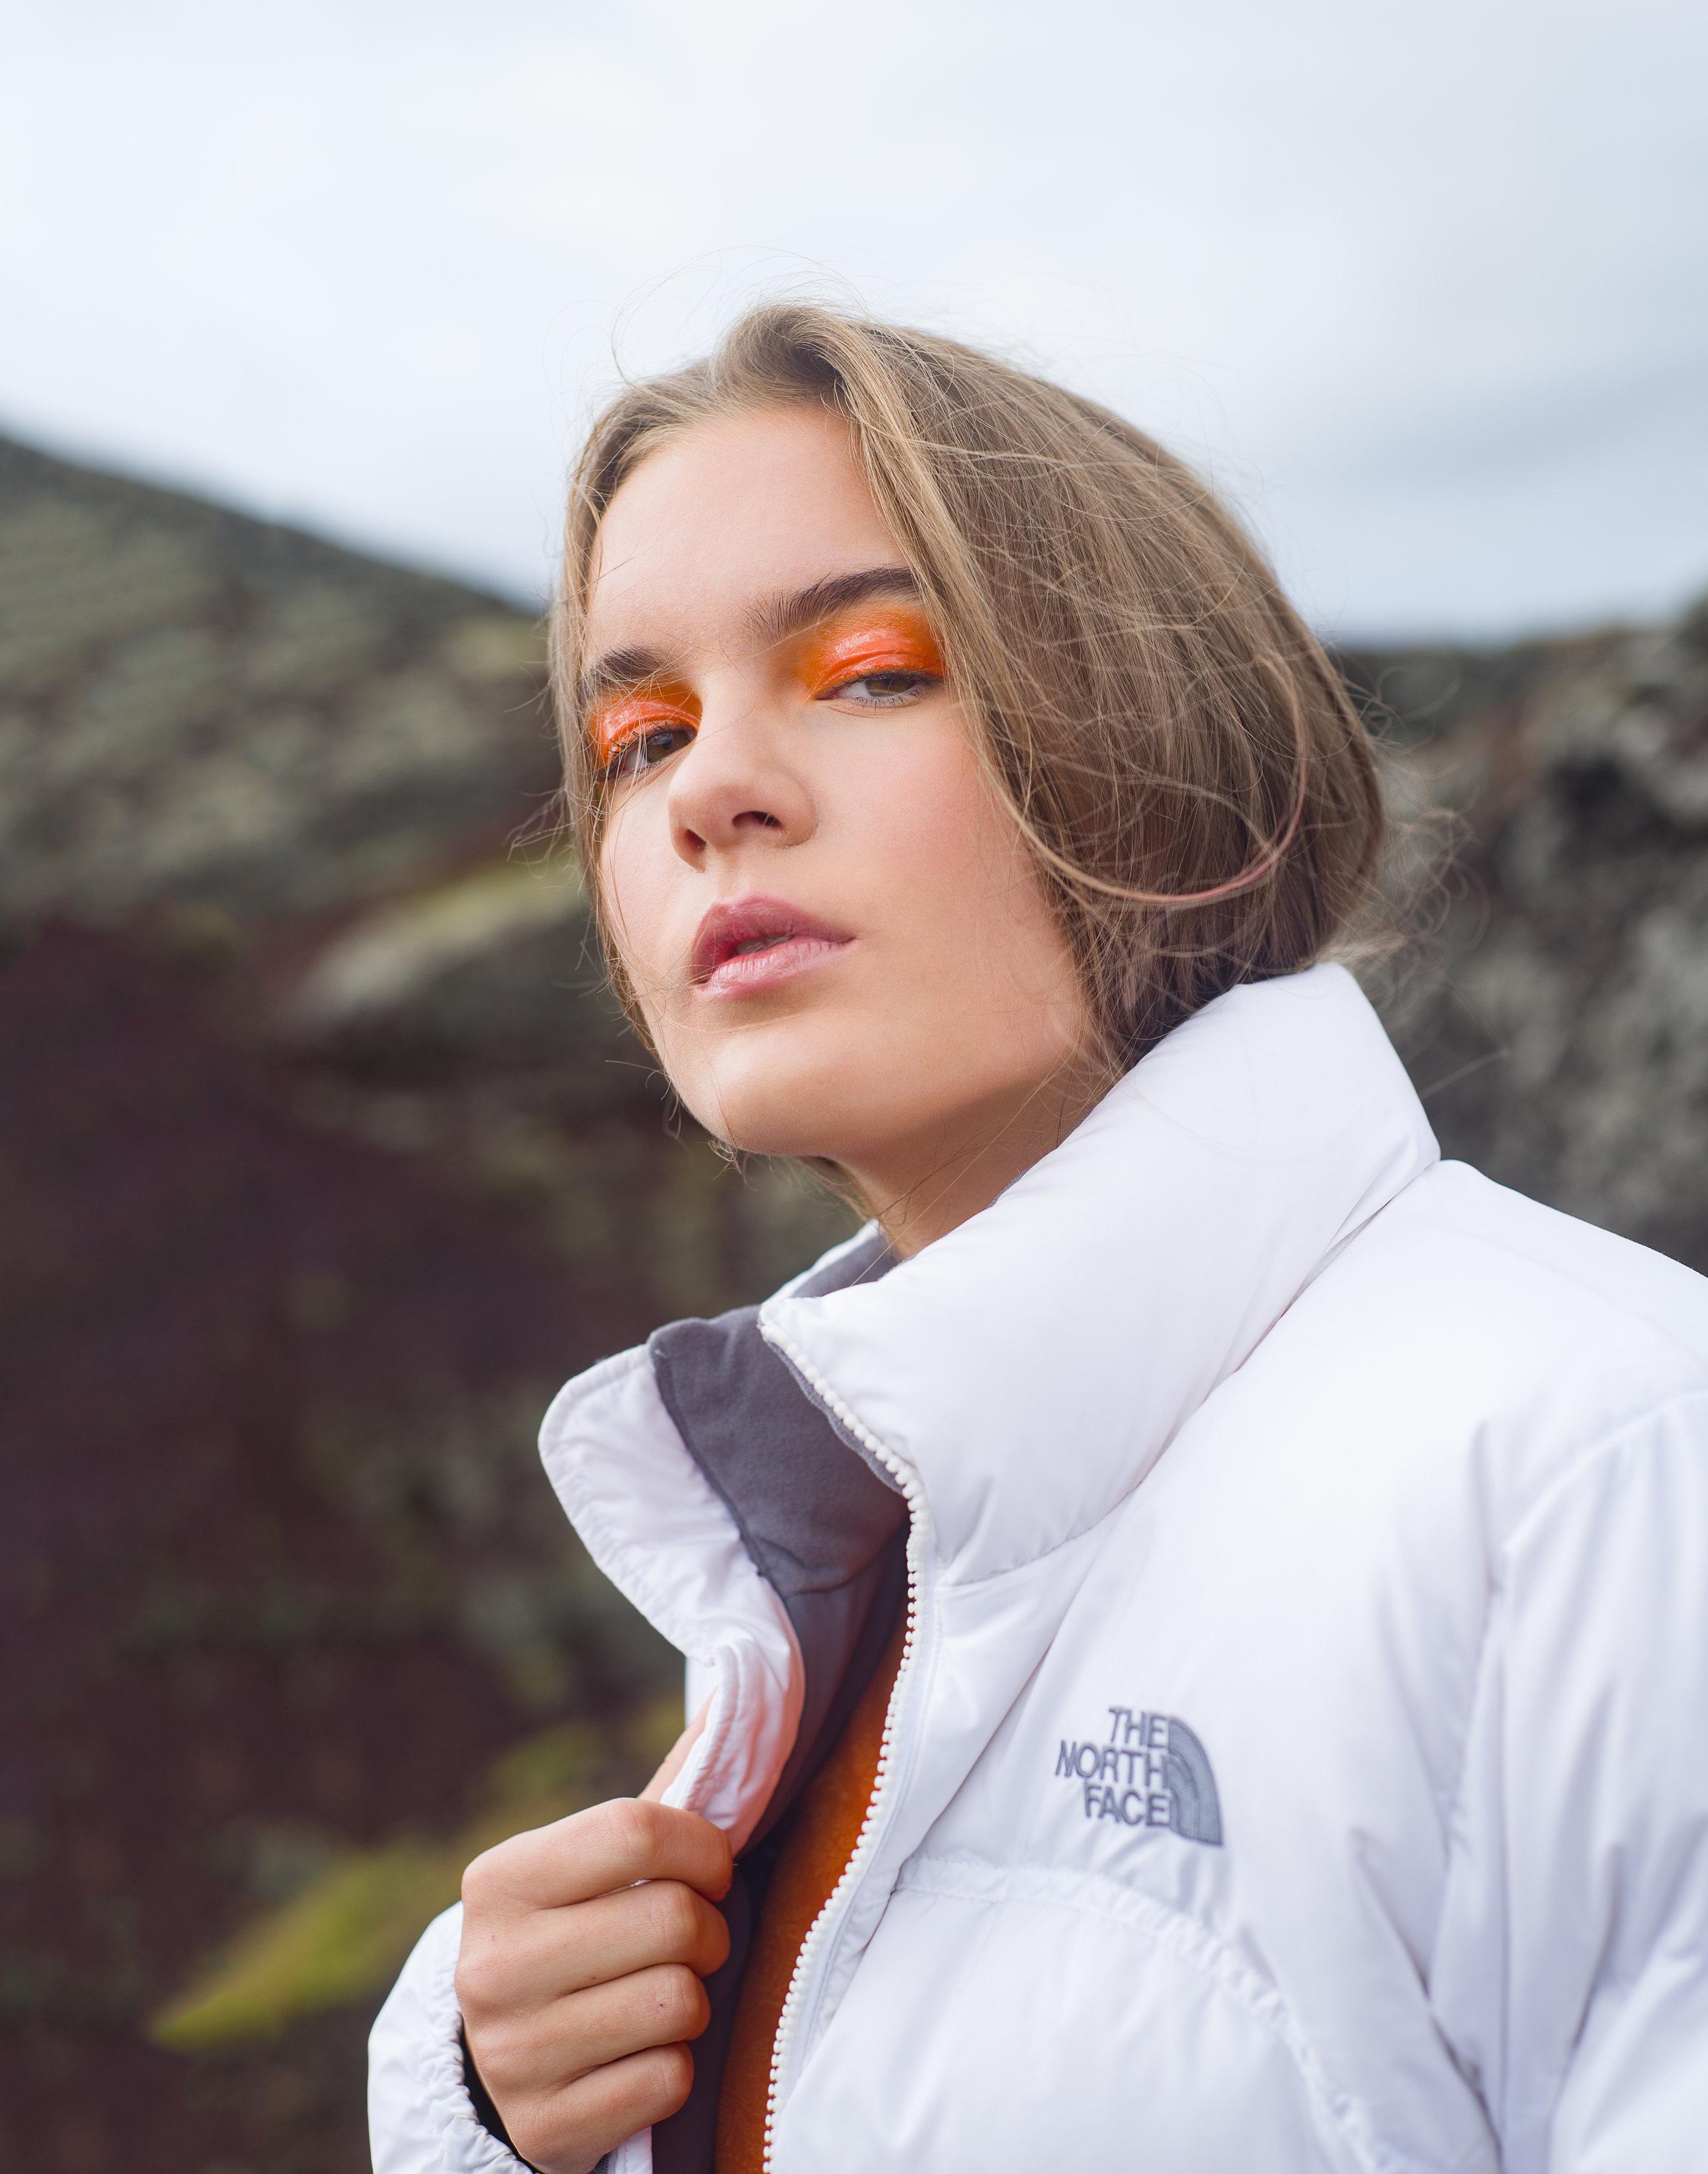 model Lana photographer  Justin W. King